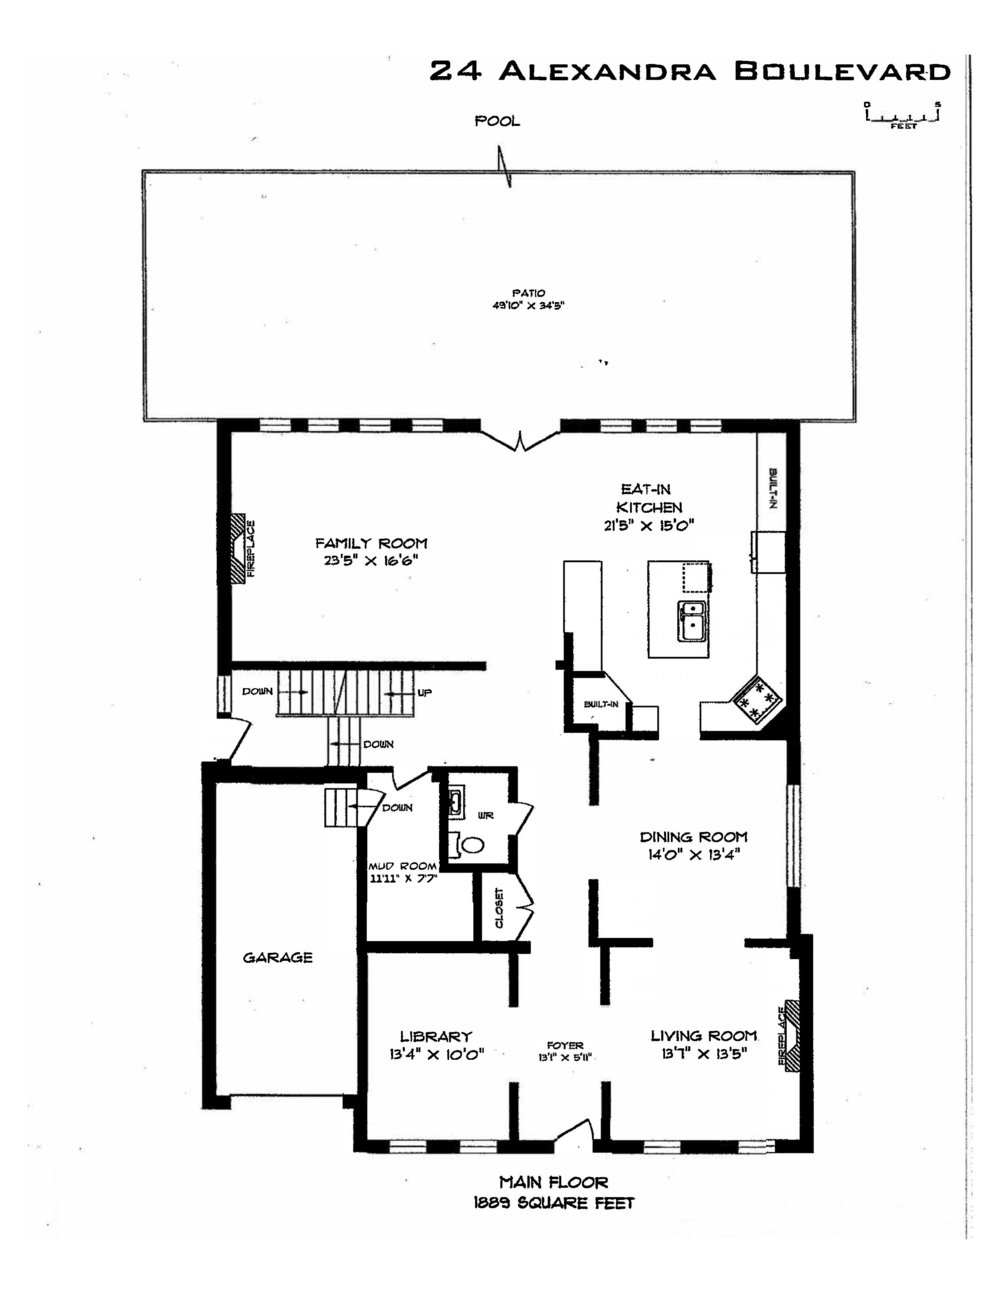 24 Alexandra floor plans_Page_3.jpg